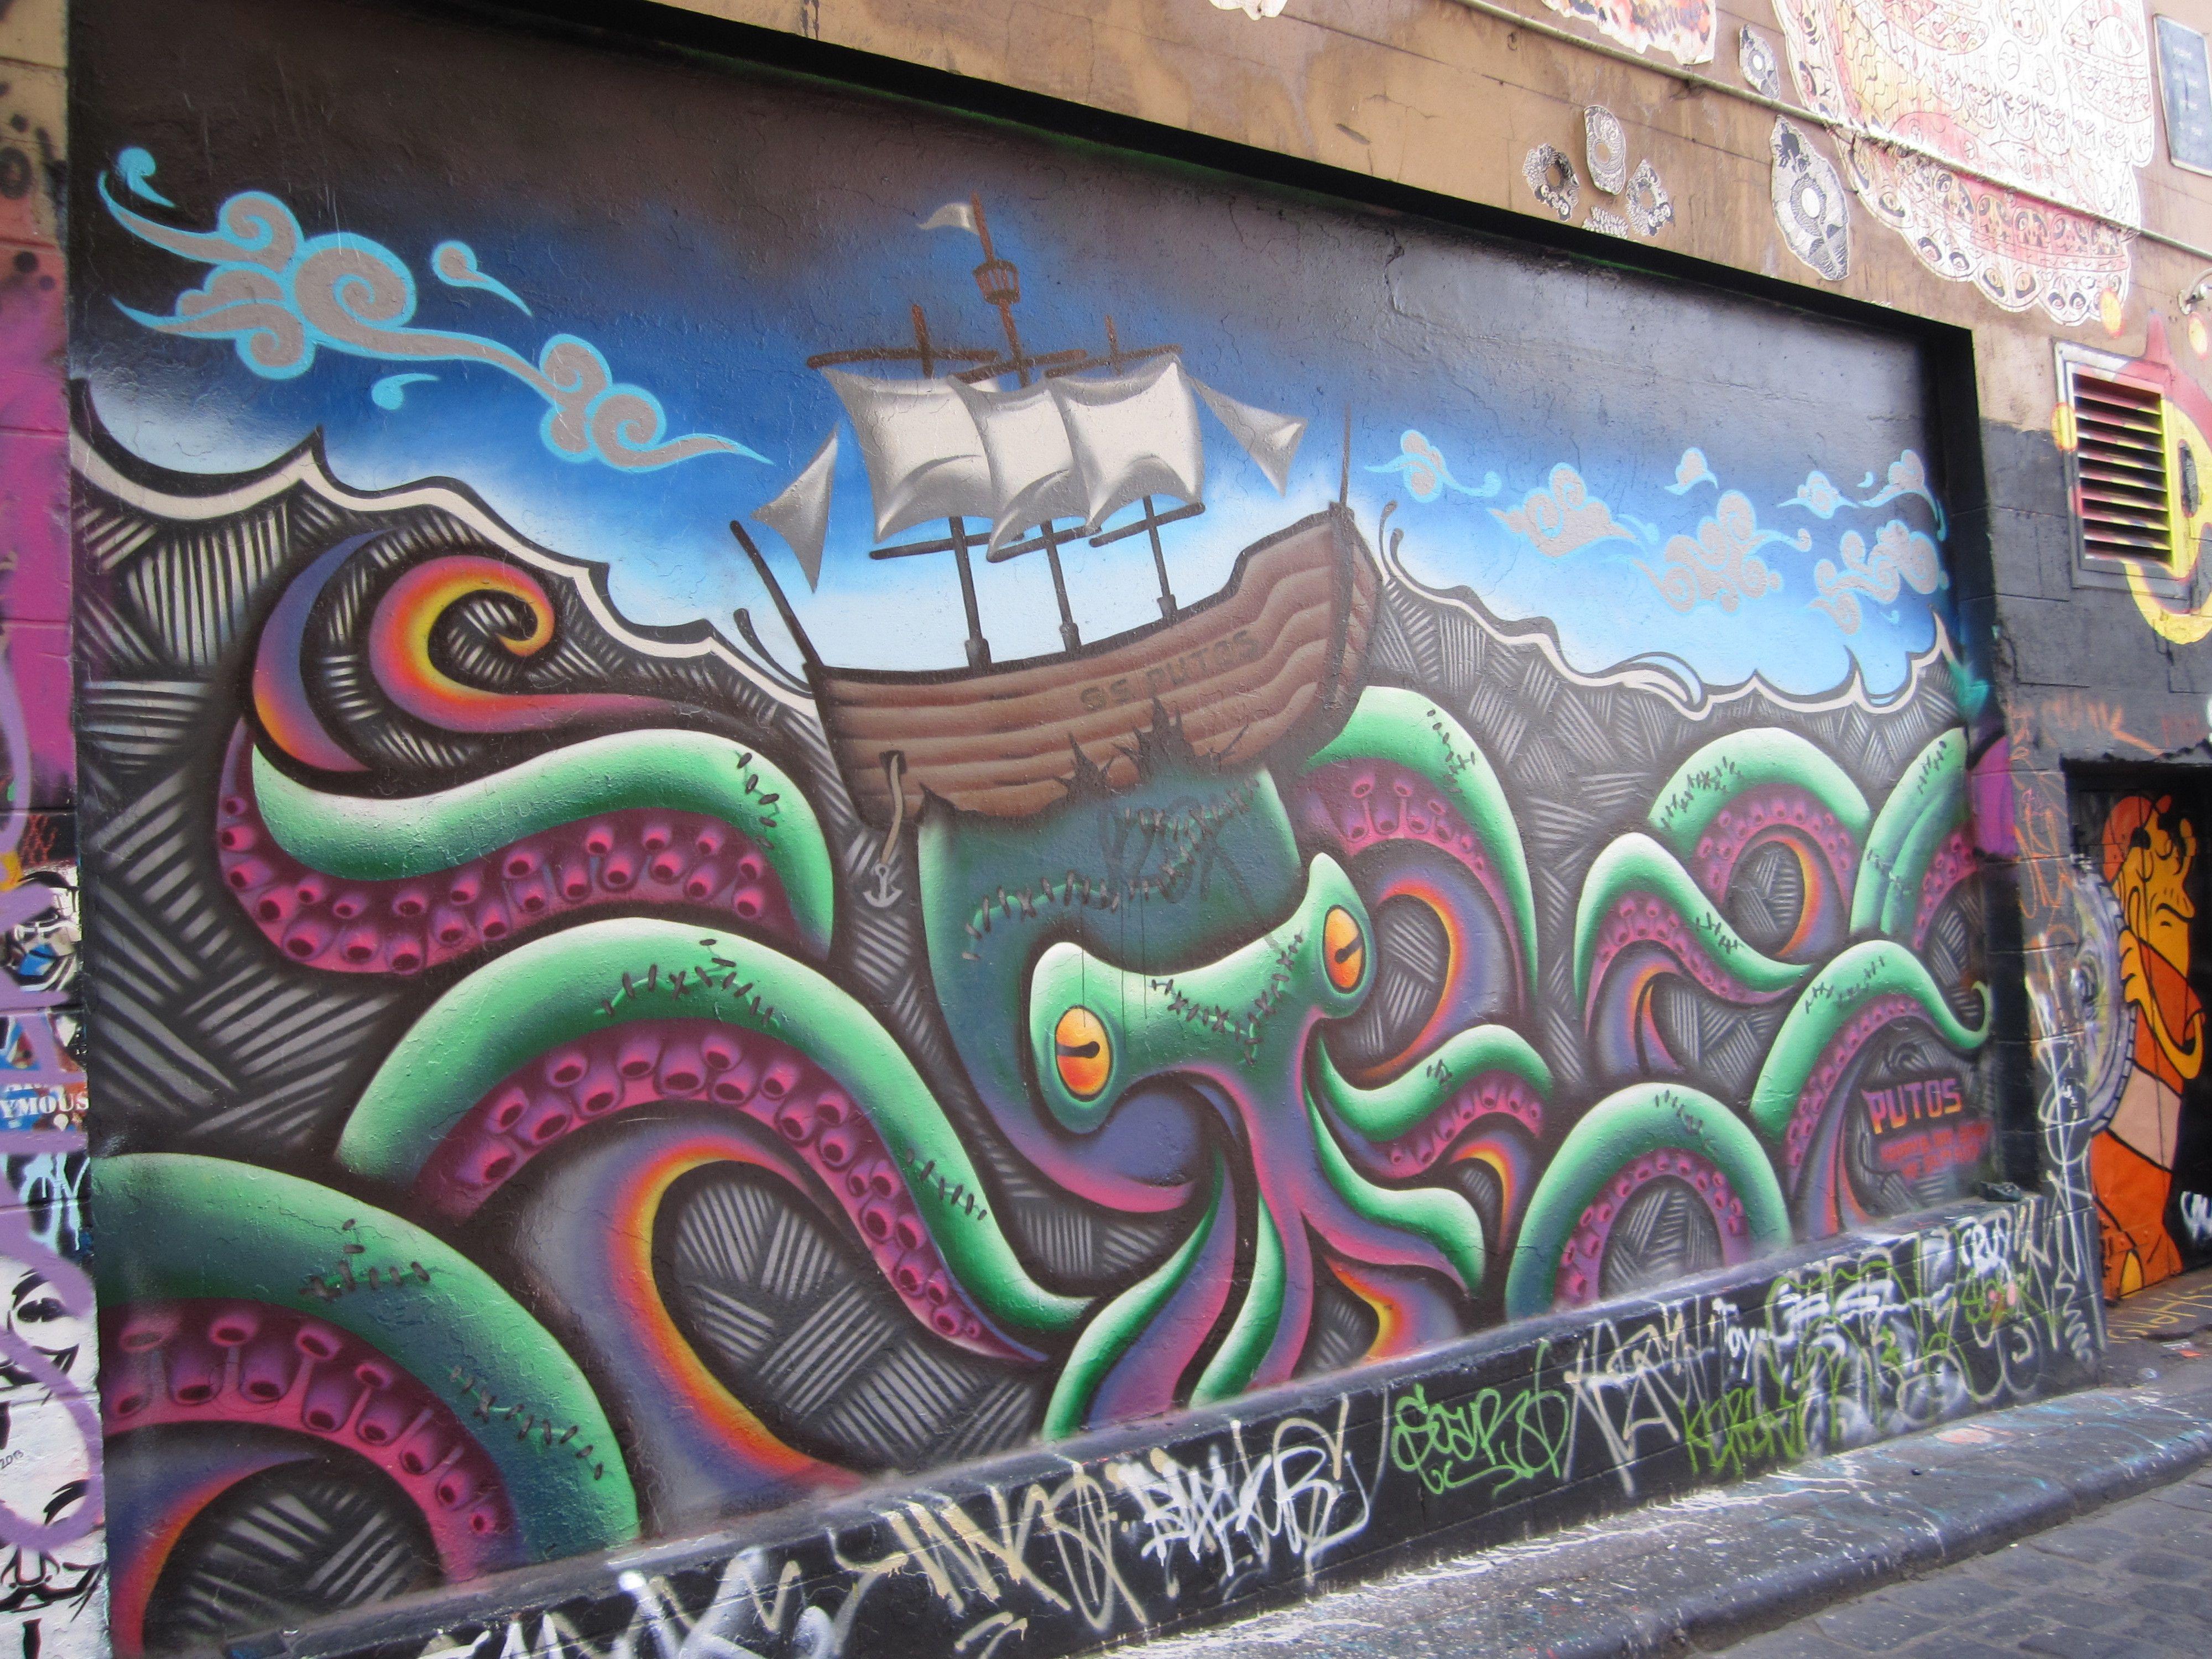 Melbourne Street Art - WeekendNotes